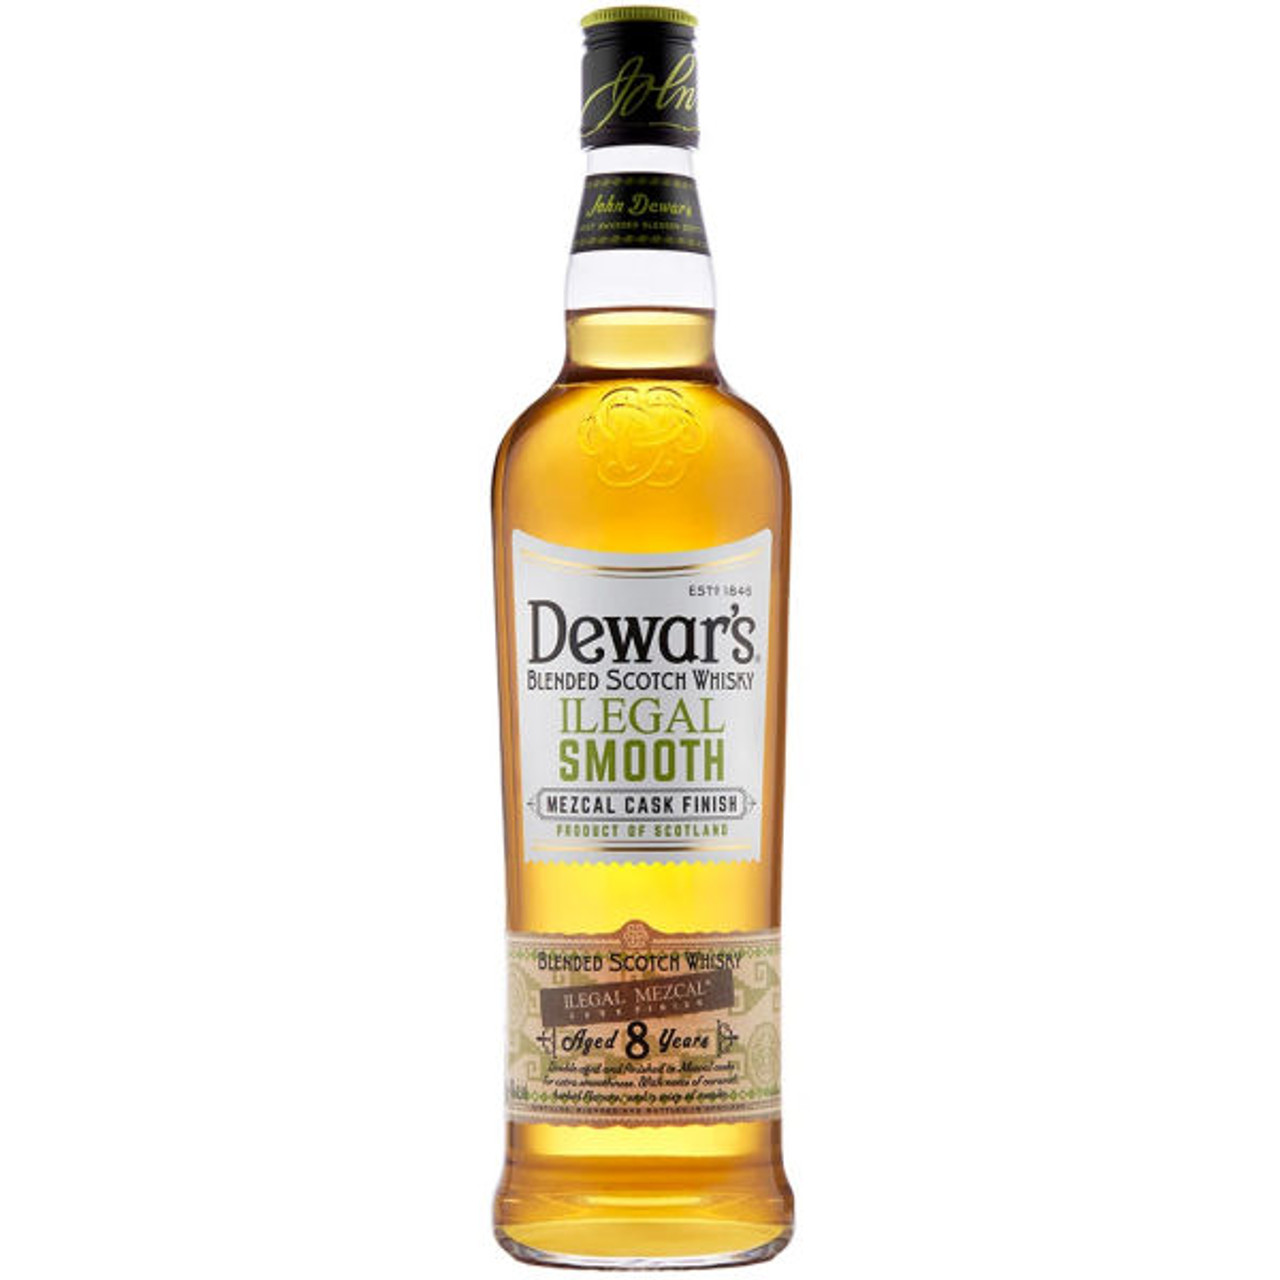 Dewar's Ilegal Smooth Blended Scotch Whisky 750ml